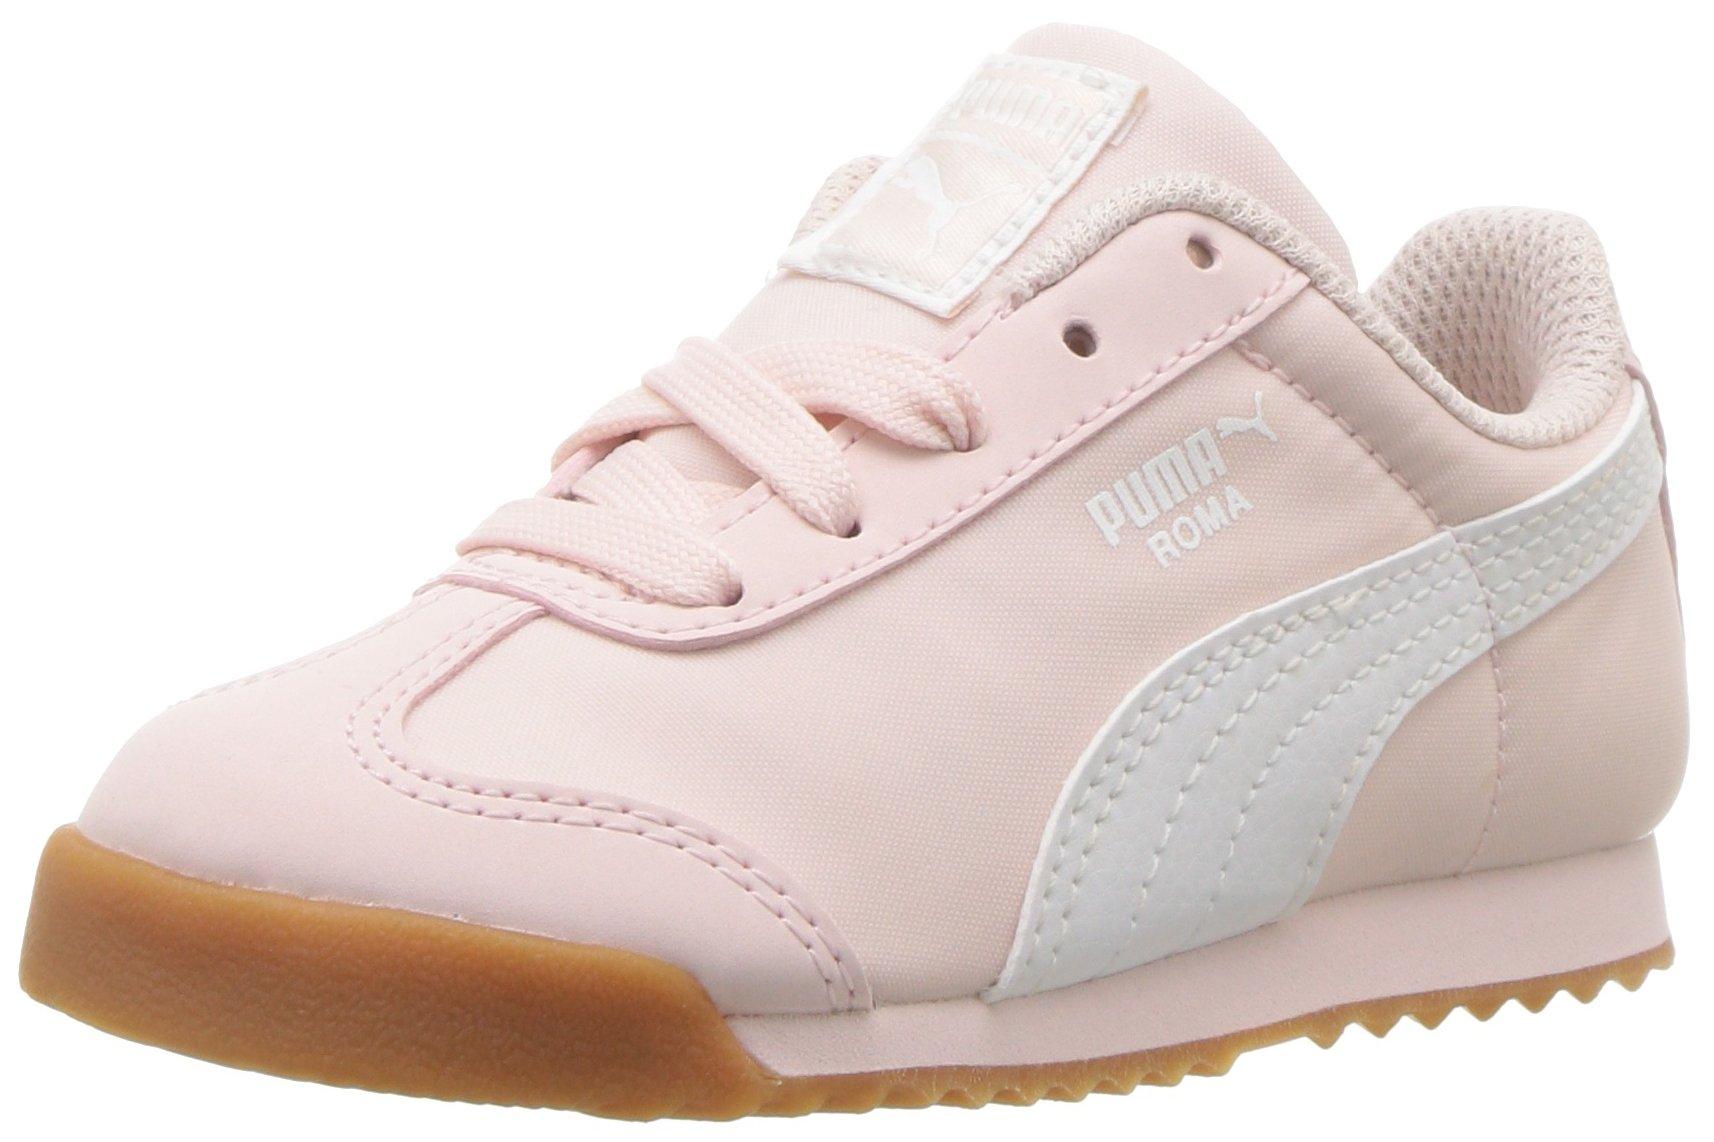 PUMA Unisex-Kids Roma Basic Summer Sneaker, Pearl White, 4 M US Big Kid